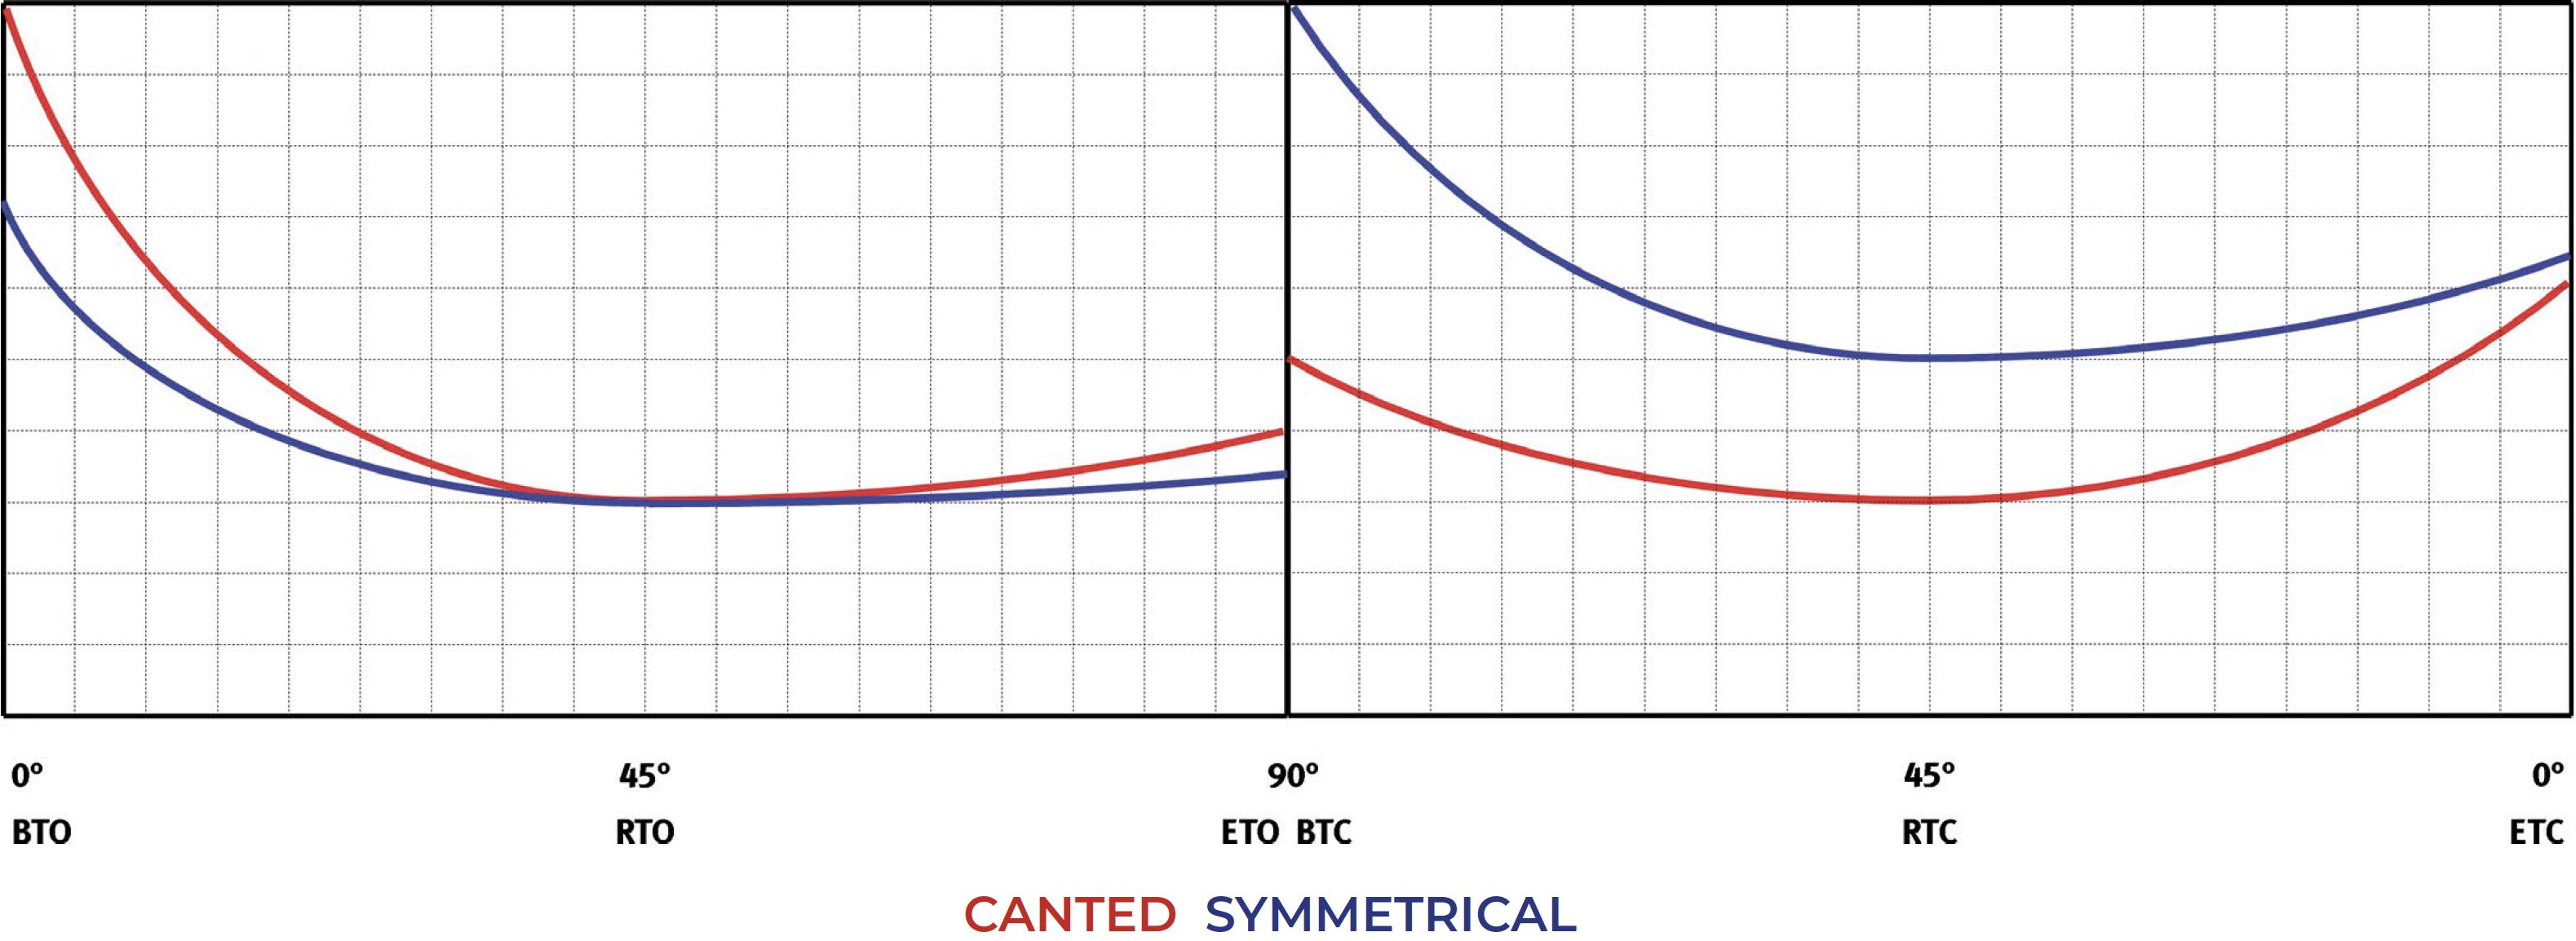 Actuador pneumático de efeito duplo GS Heavy Duty aço-carbono - diagramas e torques de partida  - Efeito Simples Normalmente Fechado - Tabela de torques (momentos de torque)